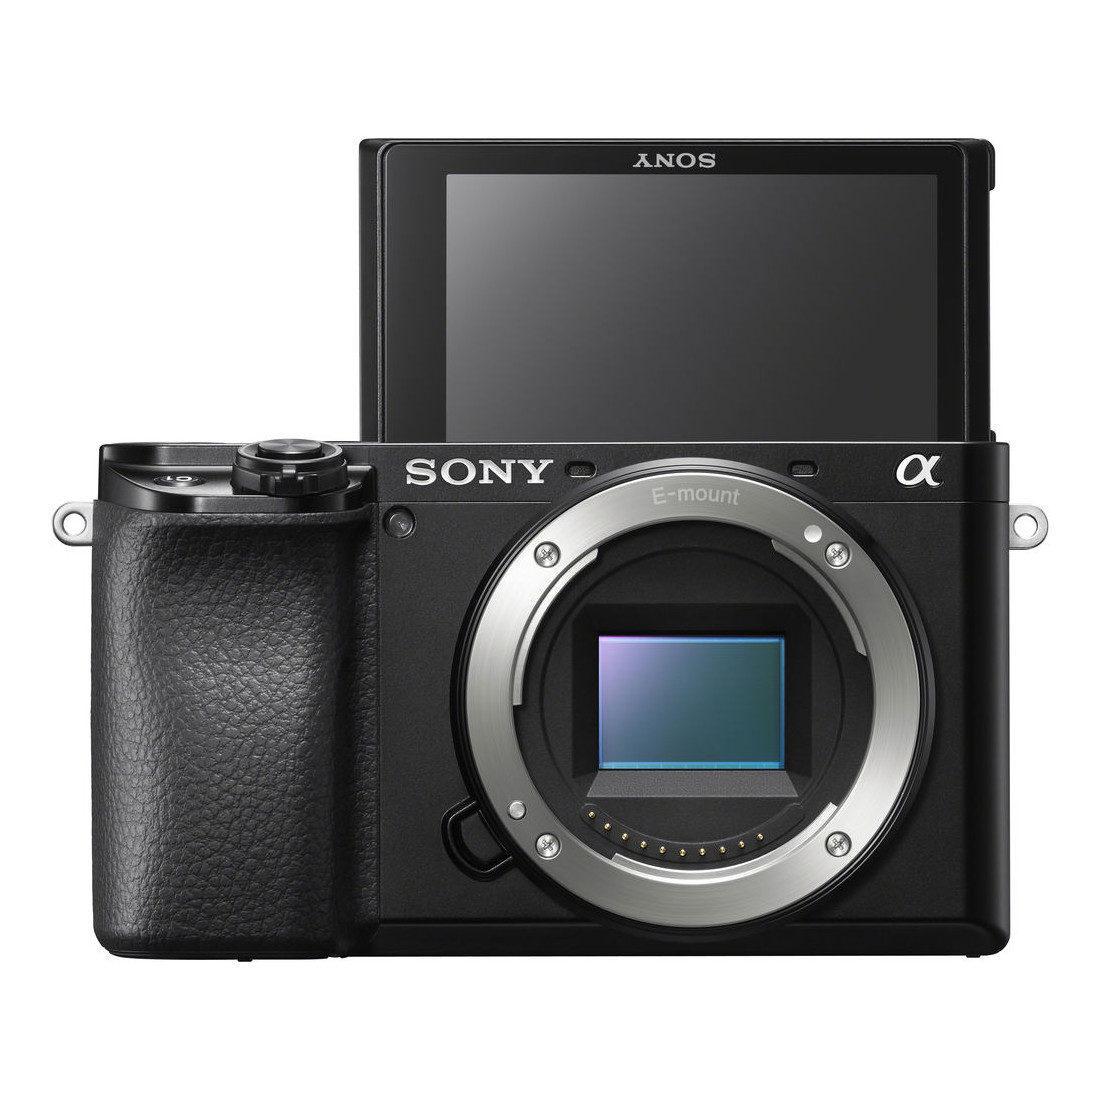 Sony Alpha A6100 systeemcamera Zwart + 18-105mm f/4.0